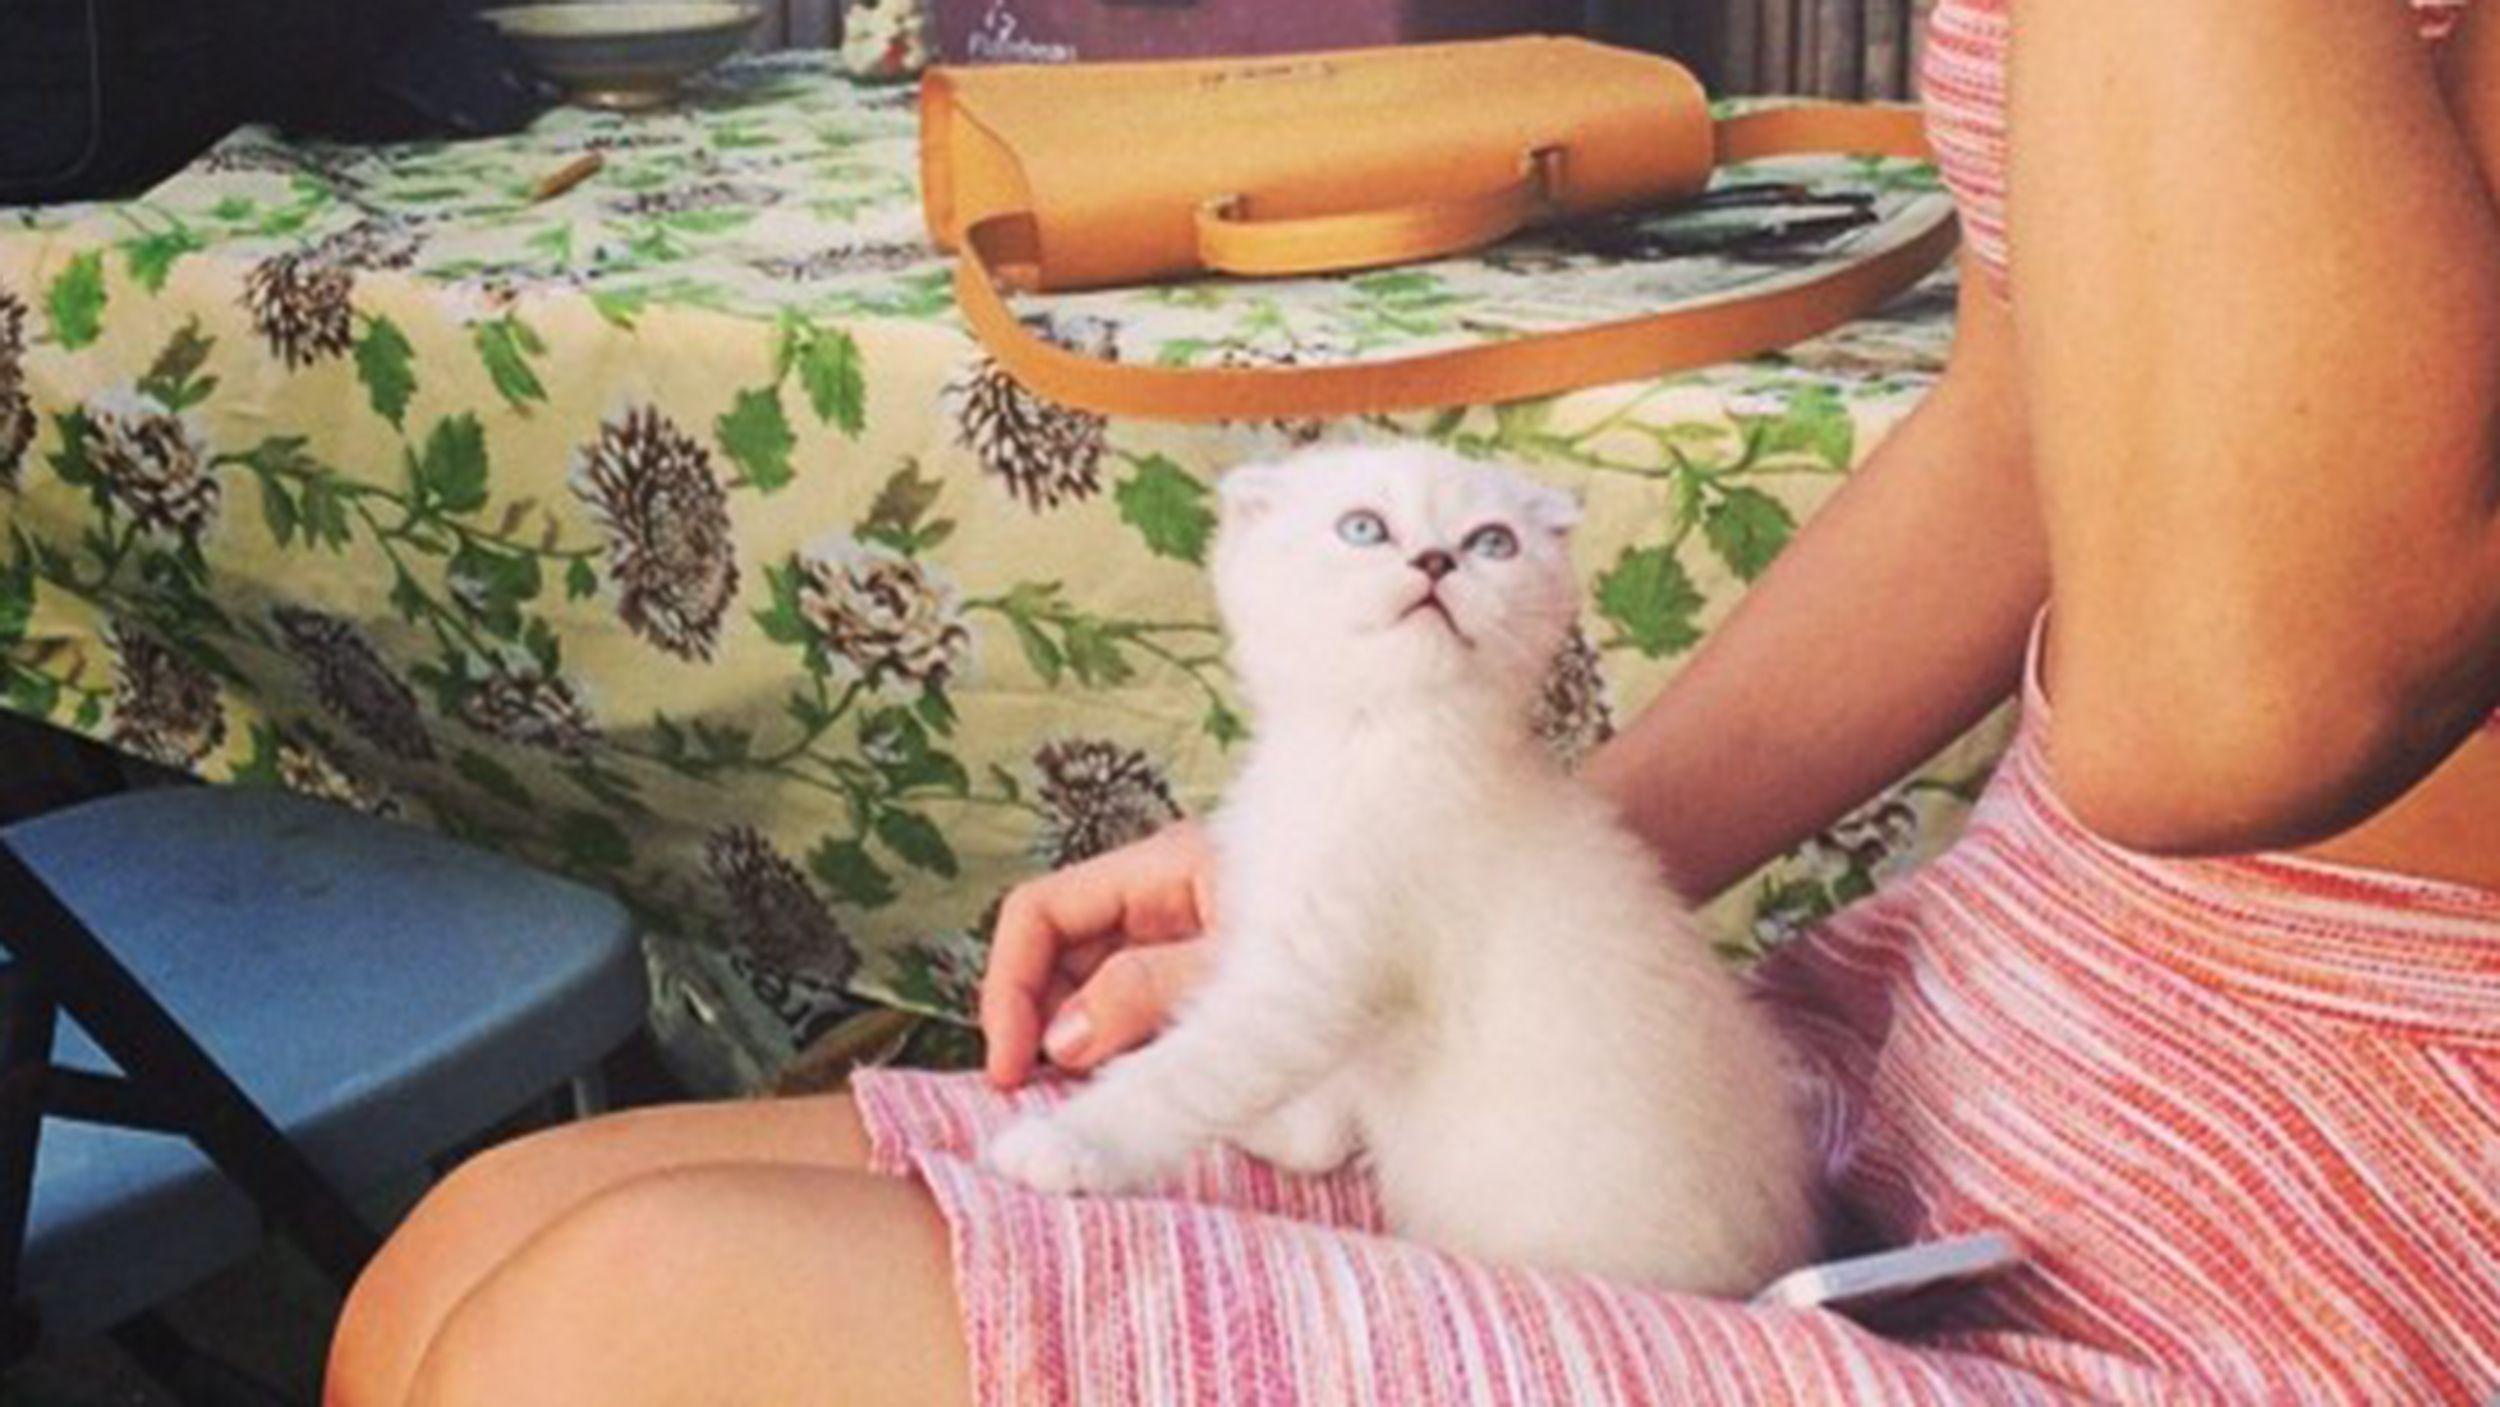 Taylor Swift Names New Kitten After Mariska Hargitay S Svu Character Cutest Kittens Ever Why Do Cats Purr Mariska Hargitay